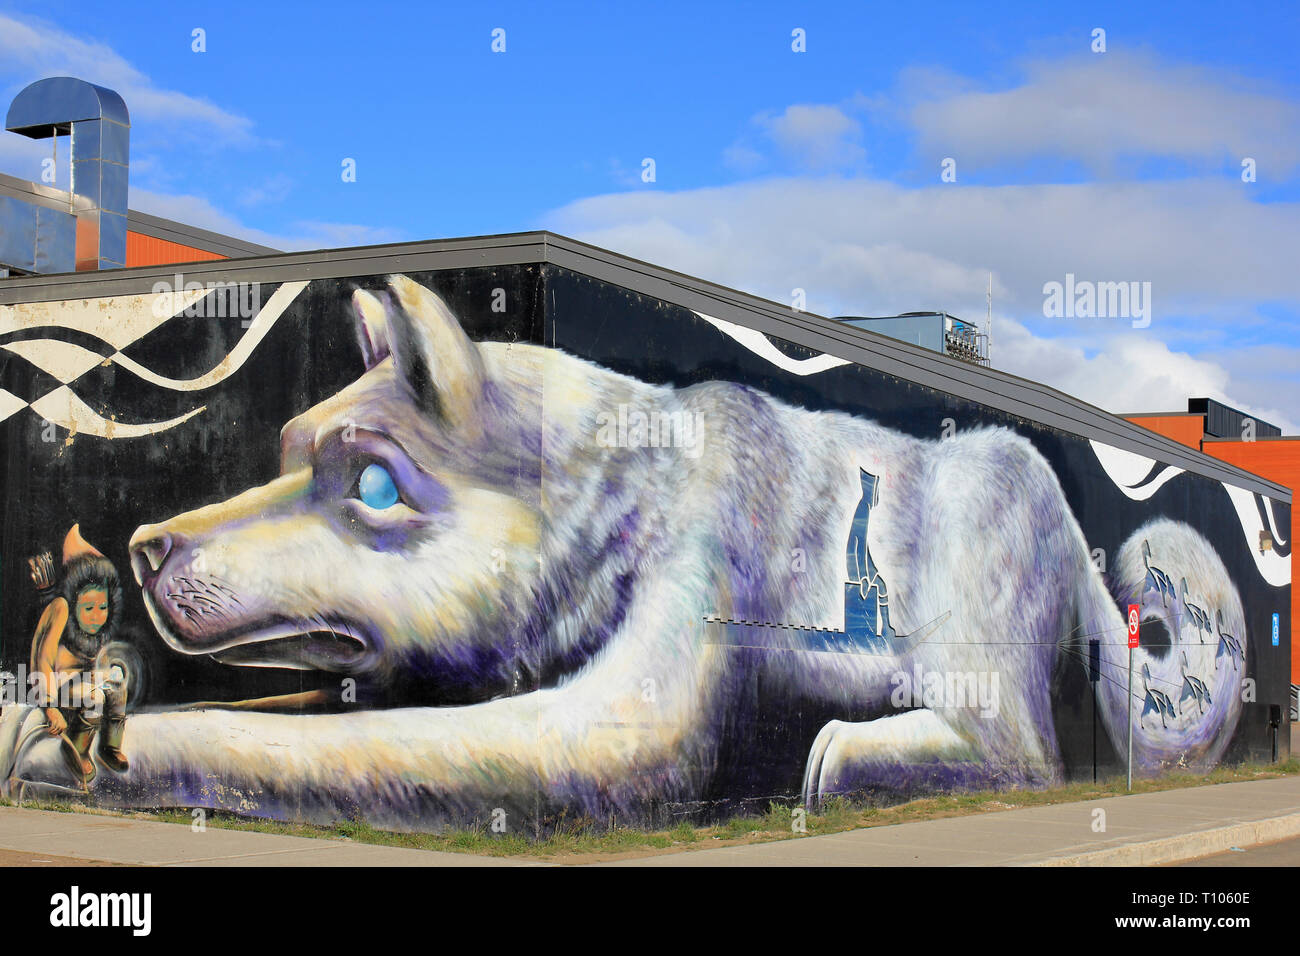 Inuit Girl and Husky Dog Art at Qikiqtani General Hospital, Iqaluit, Nunavut - Stock Image